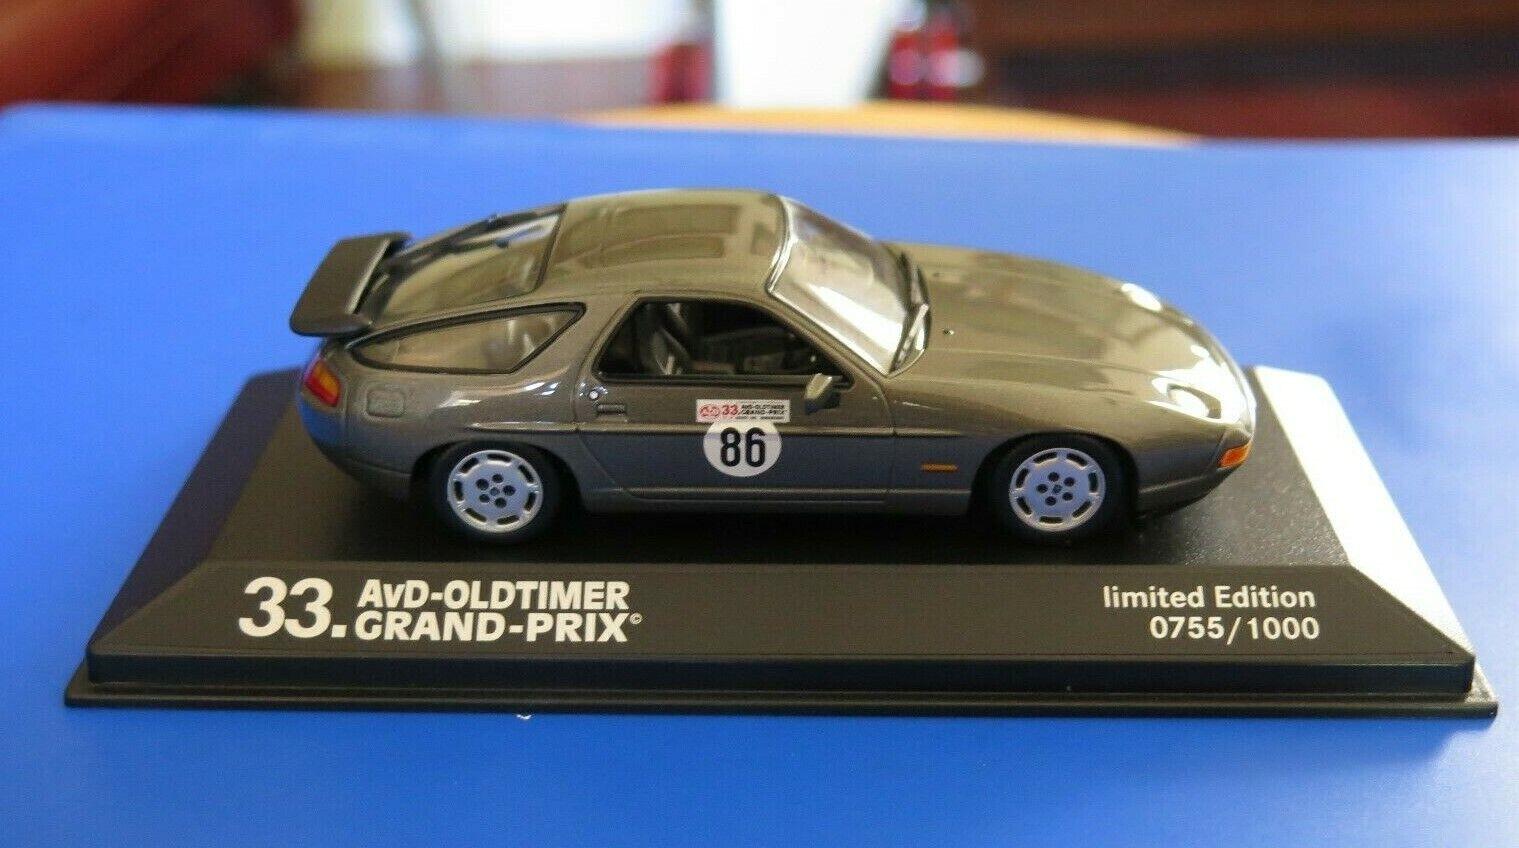 Porsche 928 S4 Minichamps. 1 43. Special edition for 33 Avd Oldtimer Grand Prix.